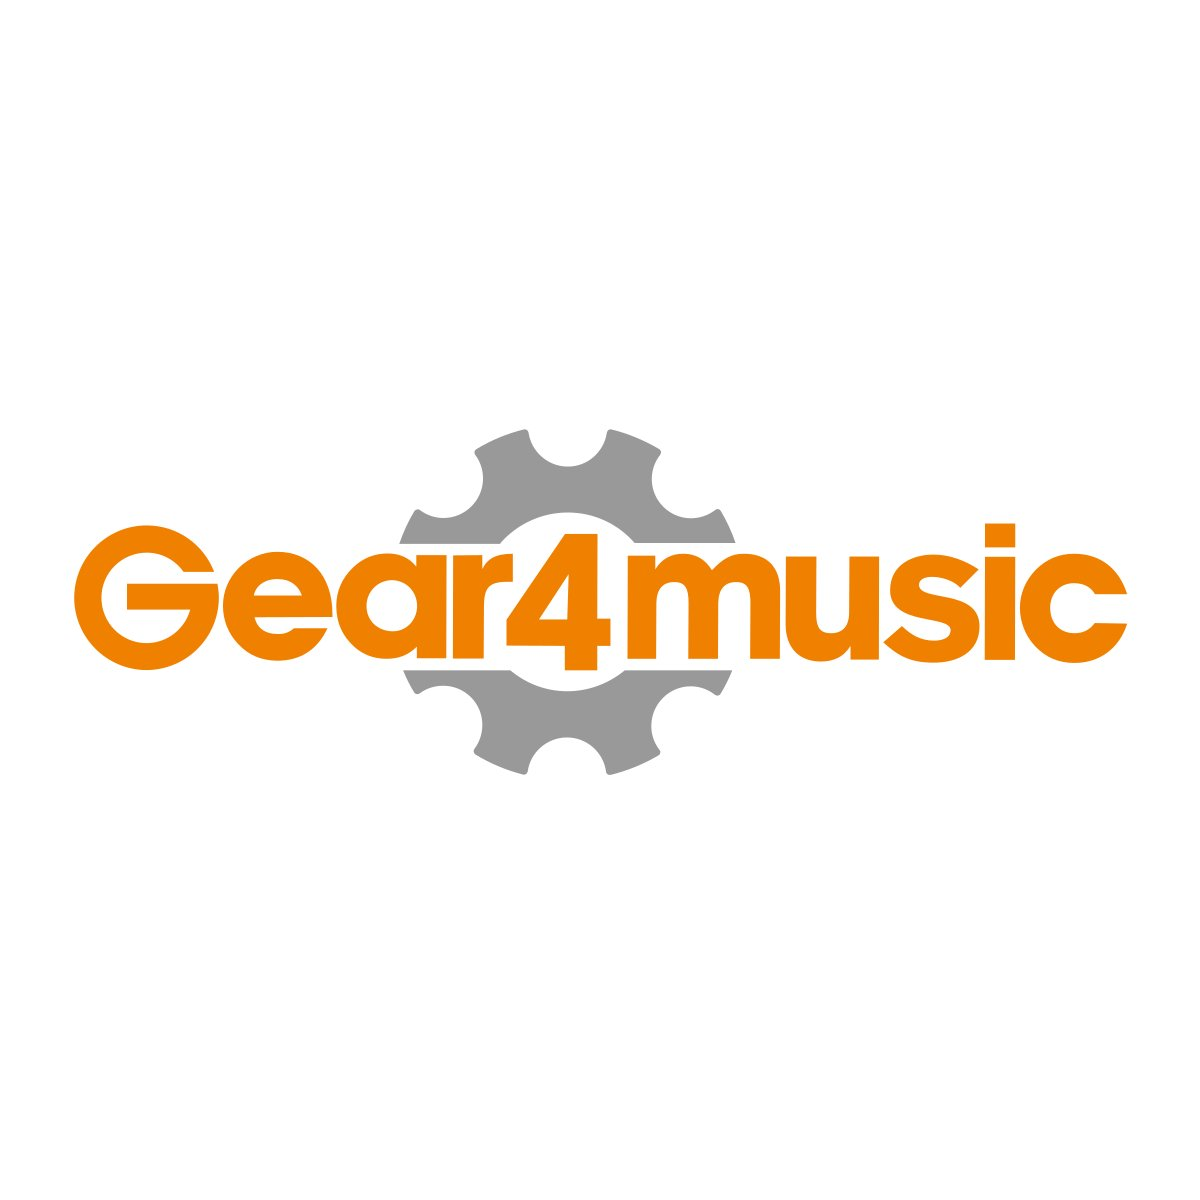 LA Electric Guitar by Gear4music, Union Jack